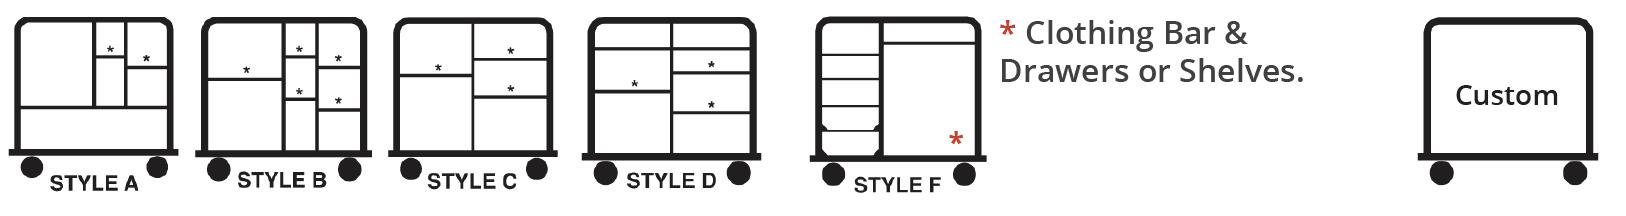 L-Series Styles